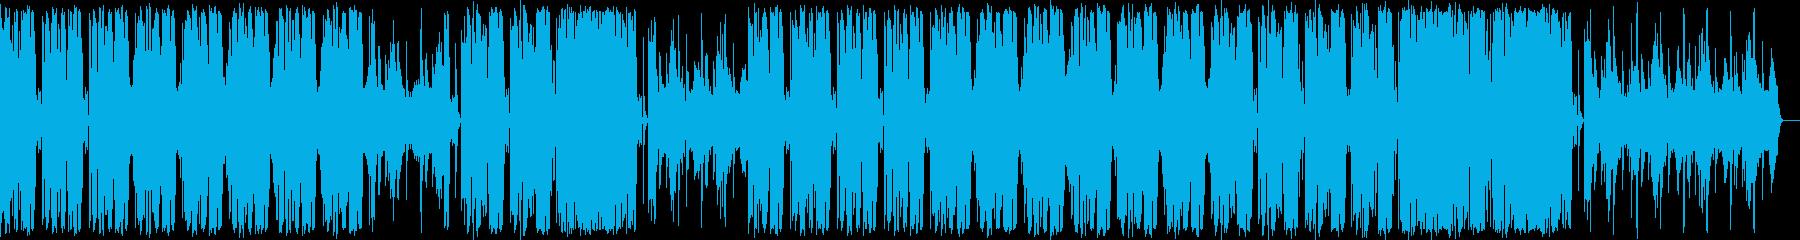 Funky Musicの再生済みの波形